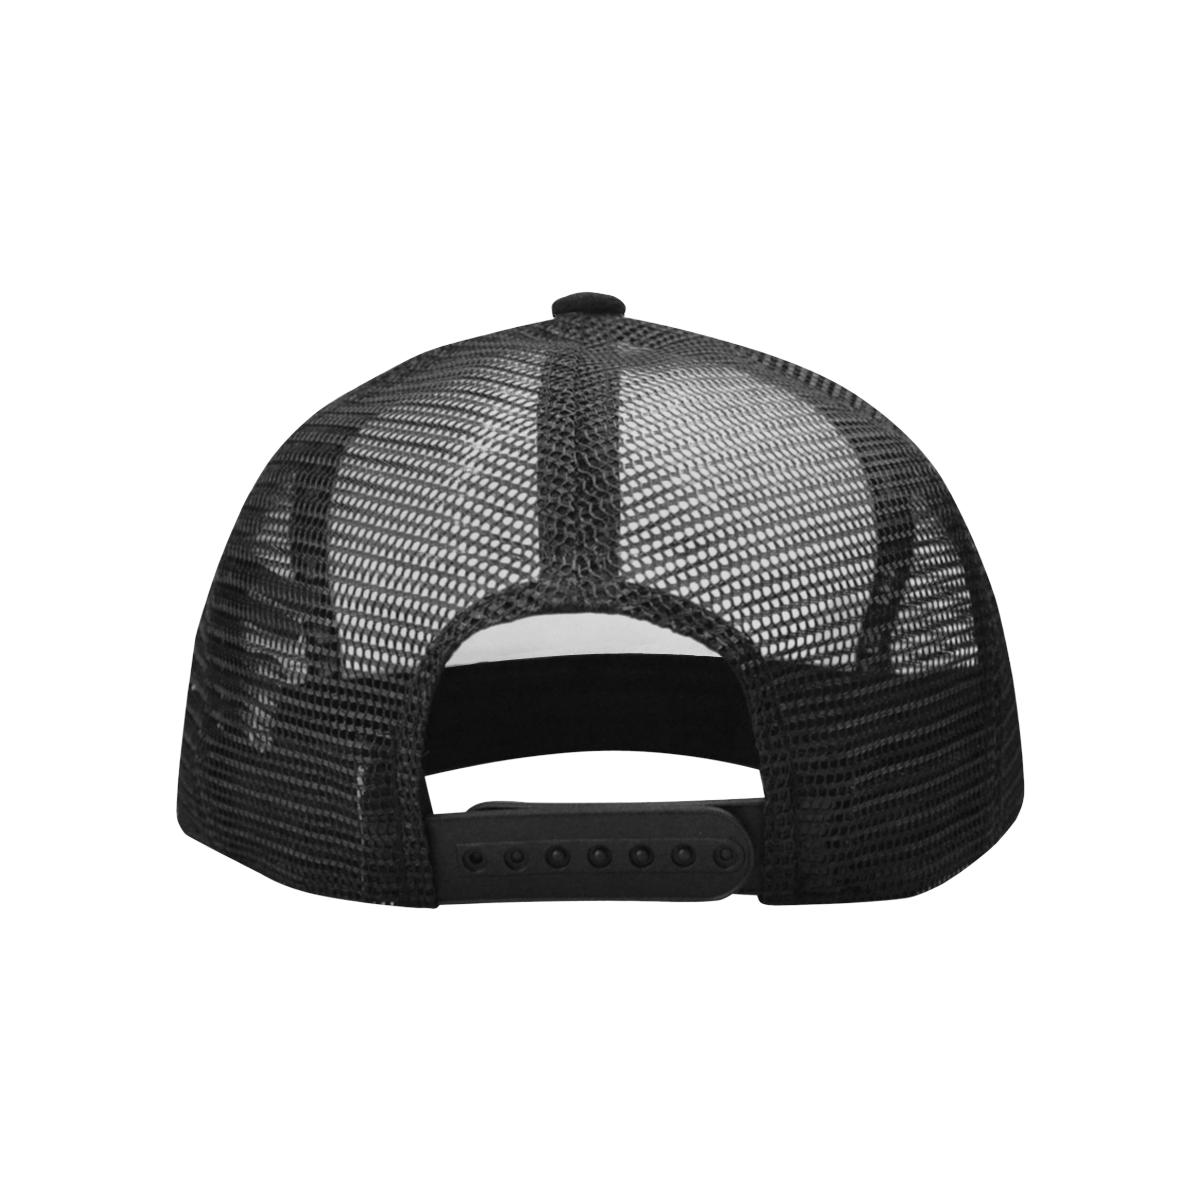 VEGAN FOR ANIMALS BASECAP Trucker Hat H (Front Panel Customization)